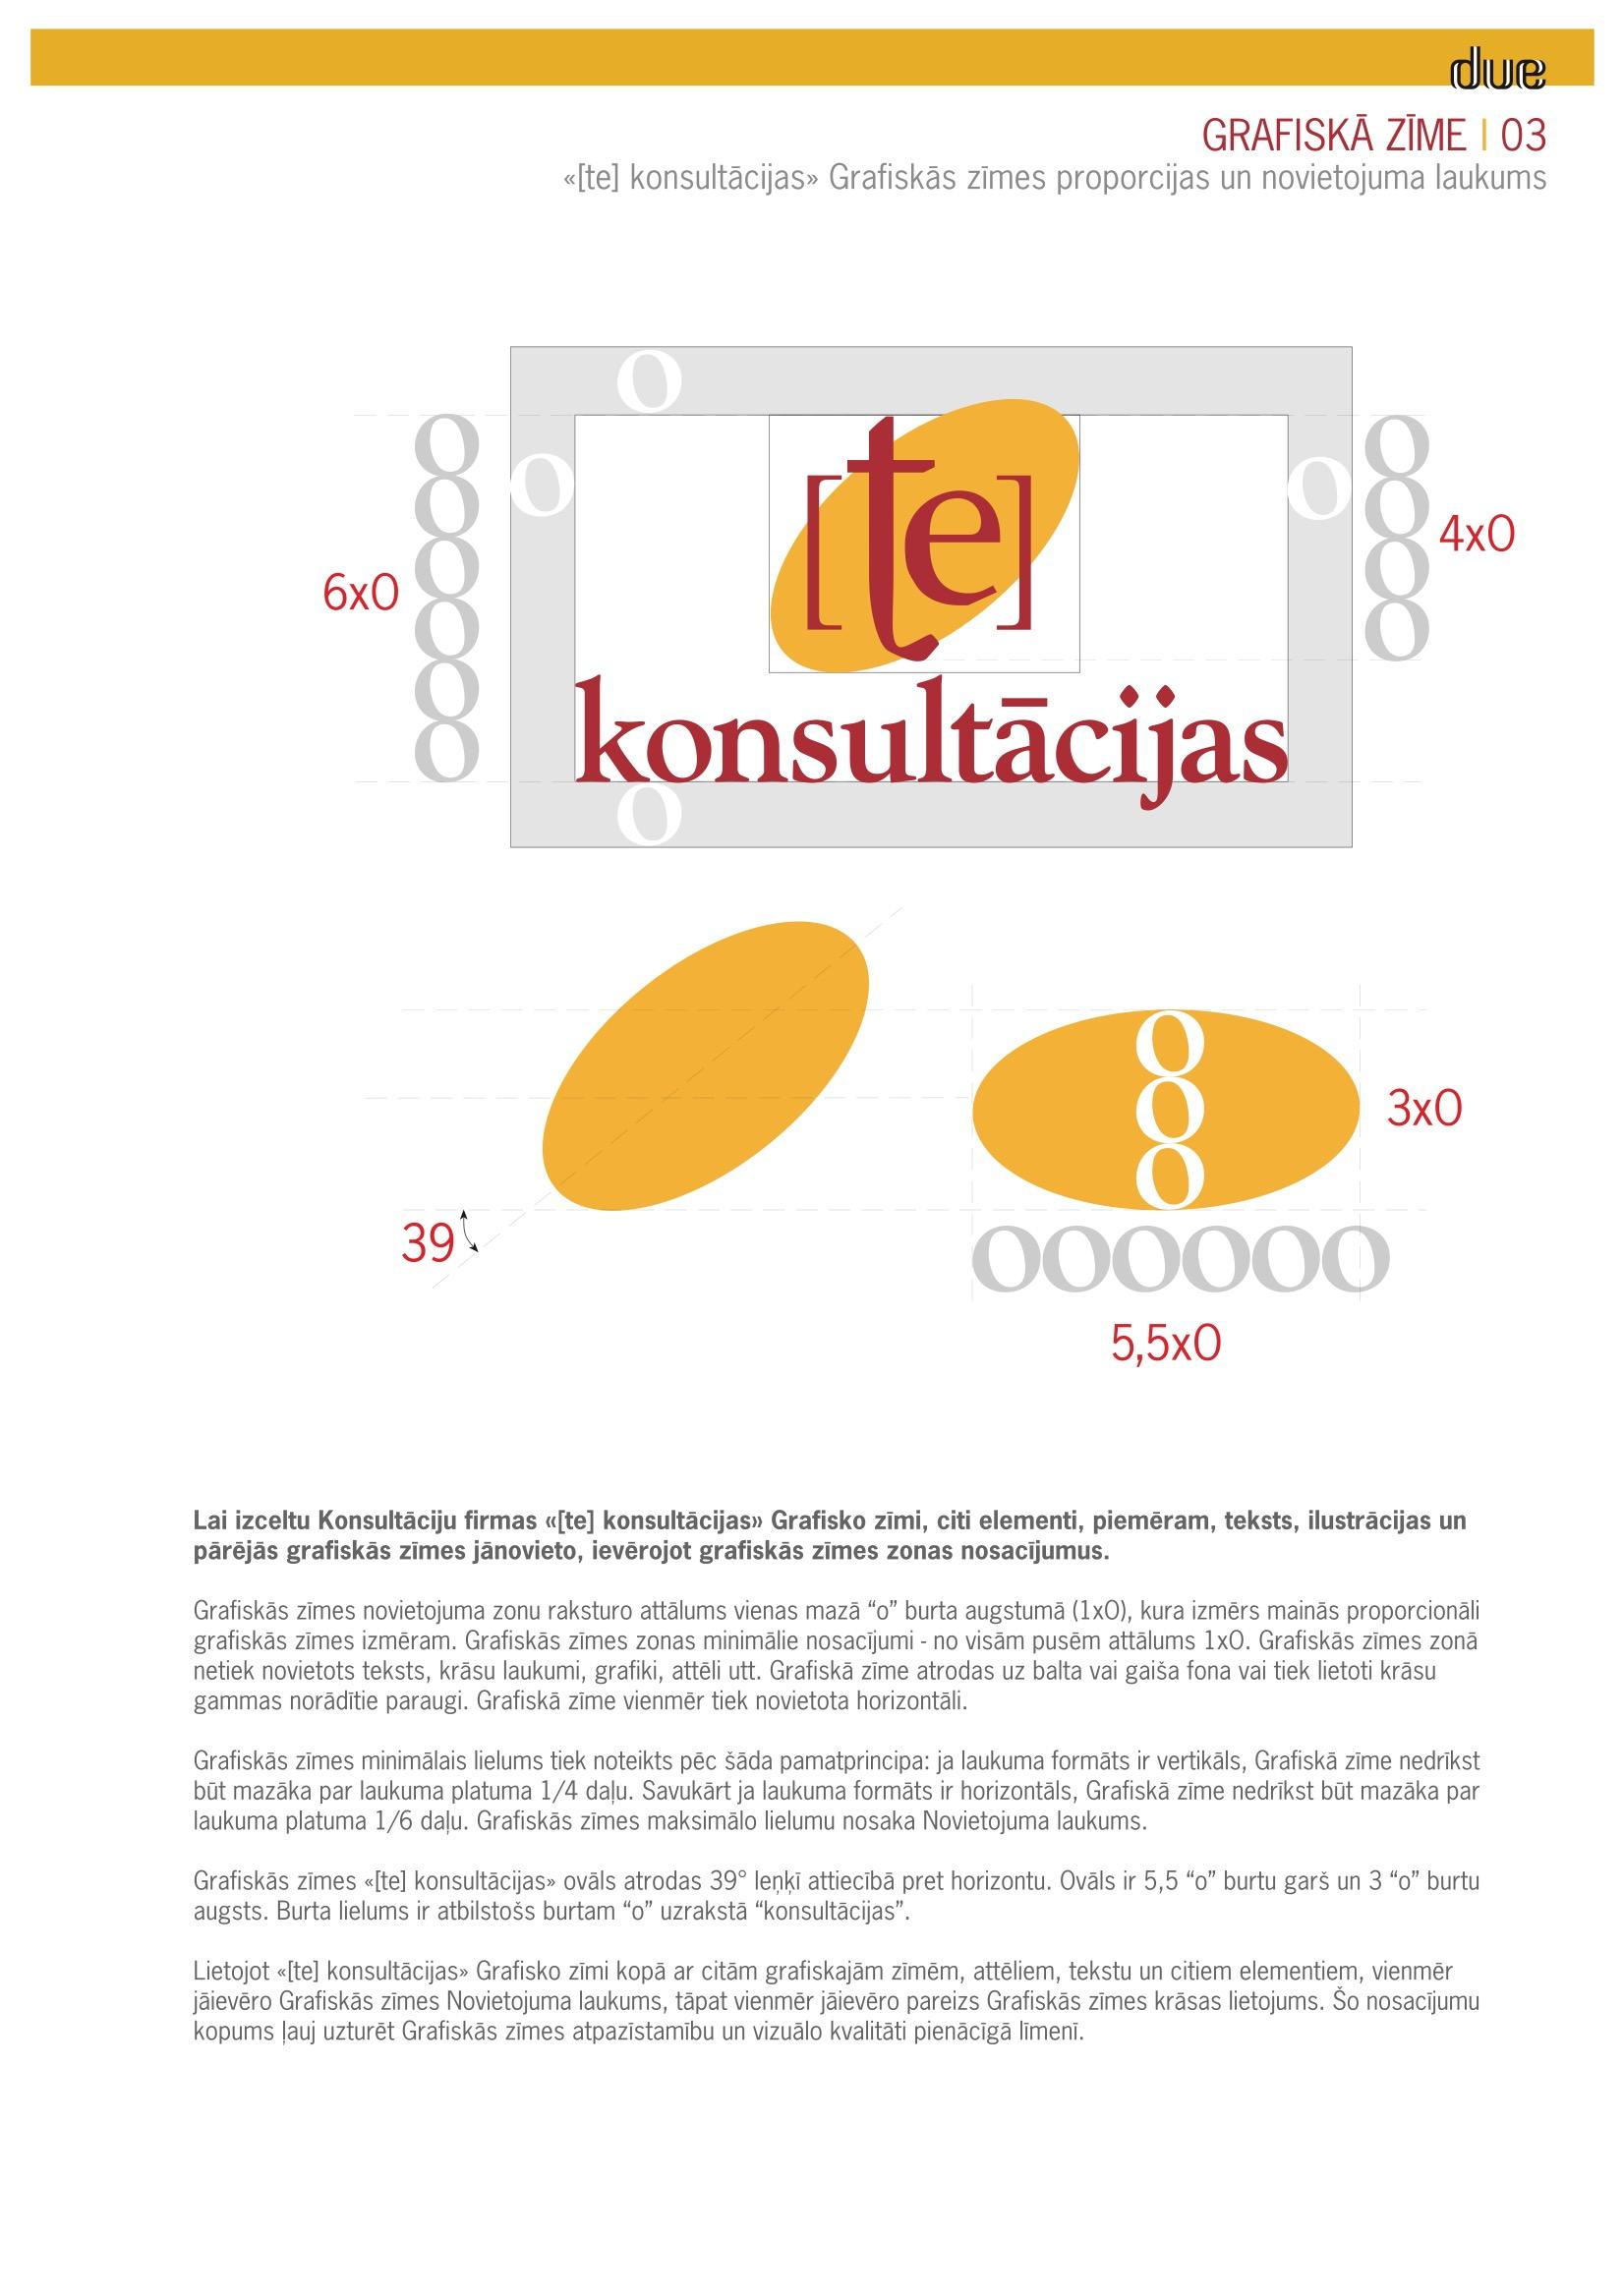 TeKonsultacijas_Stils 4